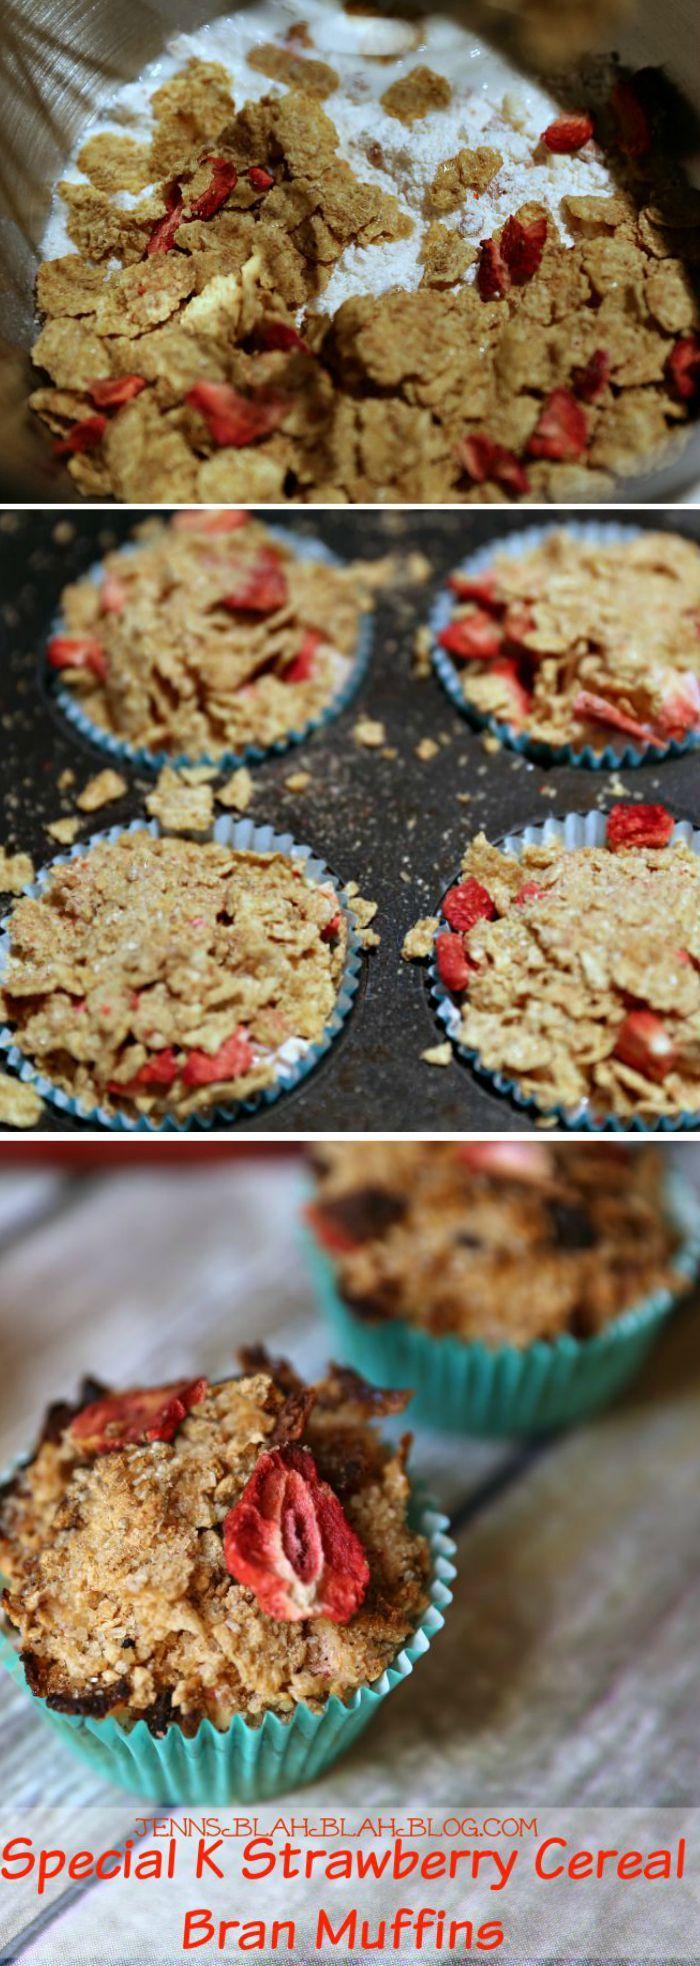 Special K Strawberry Cereal Bran Muffins Recipe |  JennsBlahBlahBlog.com | @jenblahblahblog AD ESFS